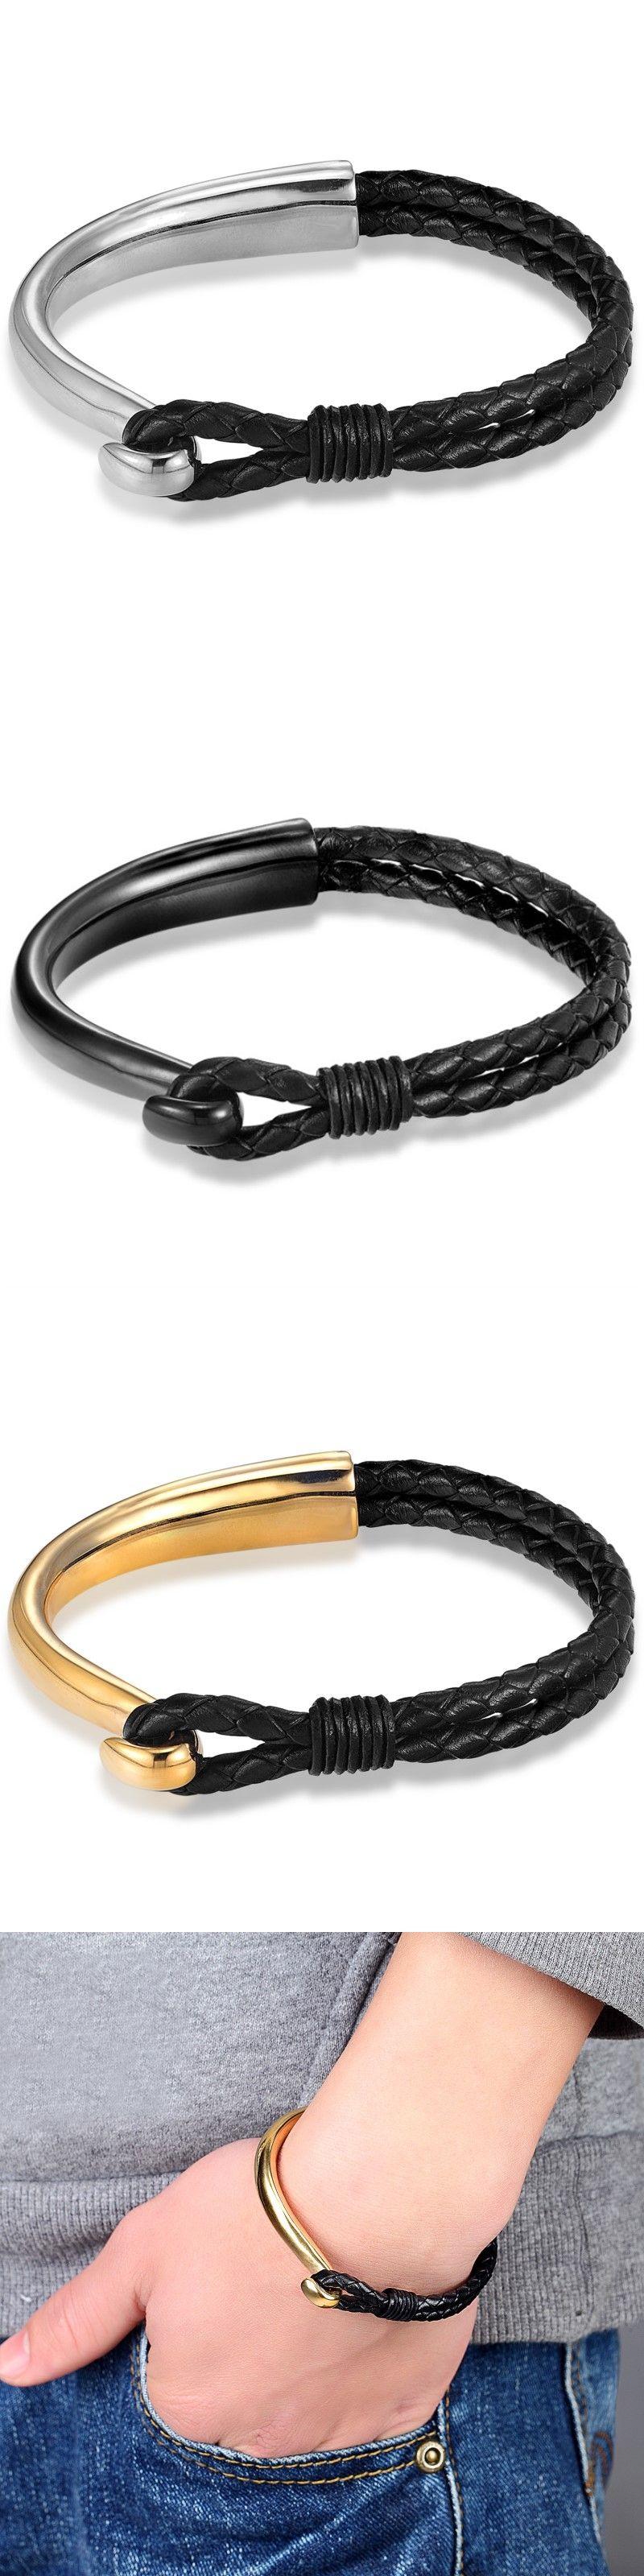 Janeyacy hot fashion men bracelet leather rope chain bracelets